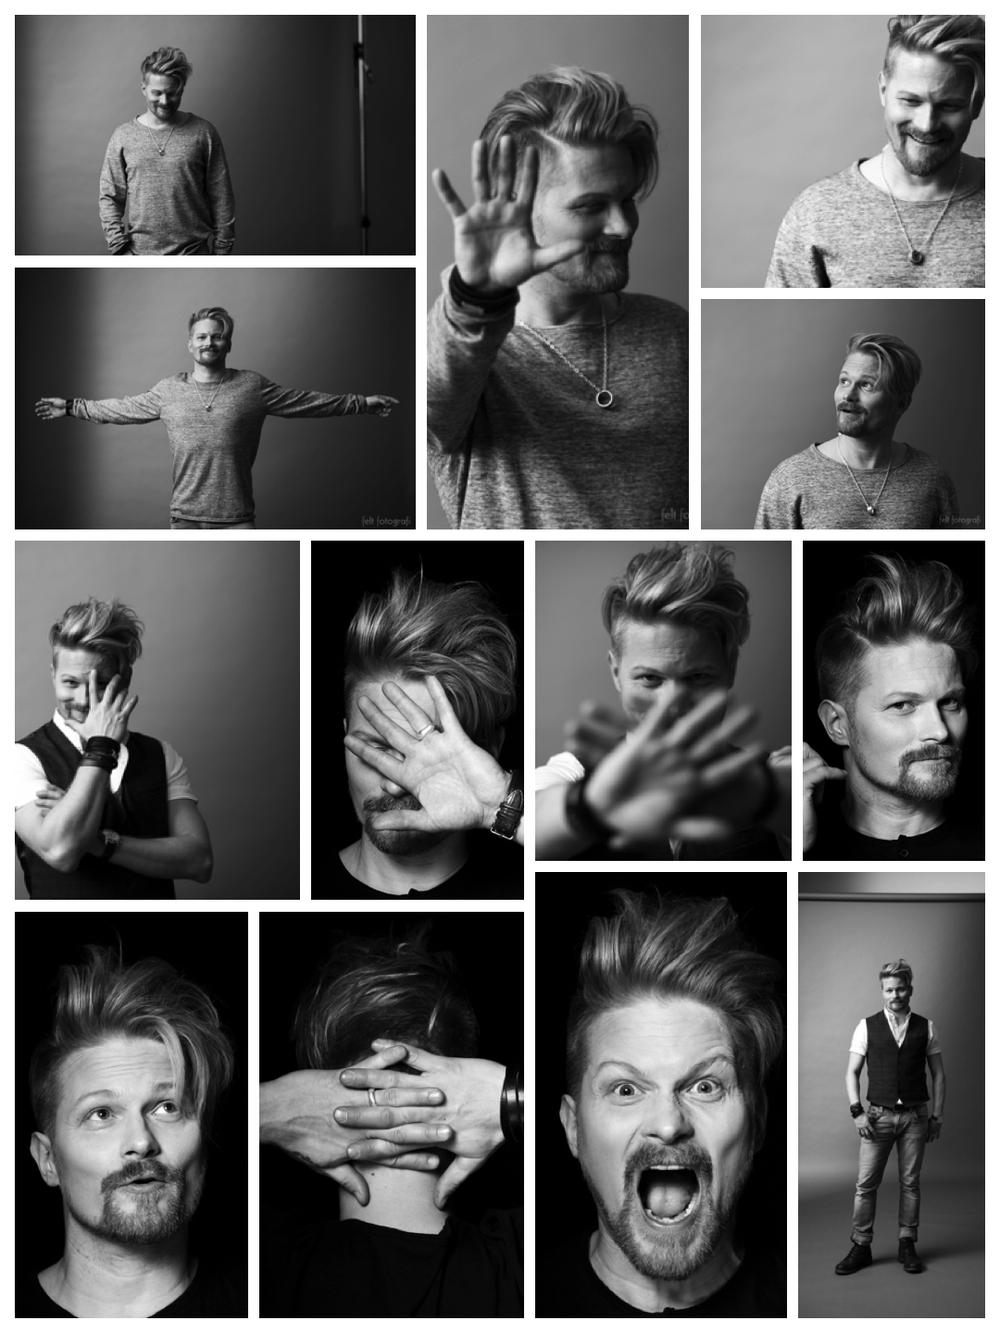 Mika Ikonen Felt Fotografin studiolla.